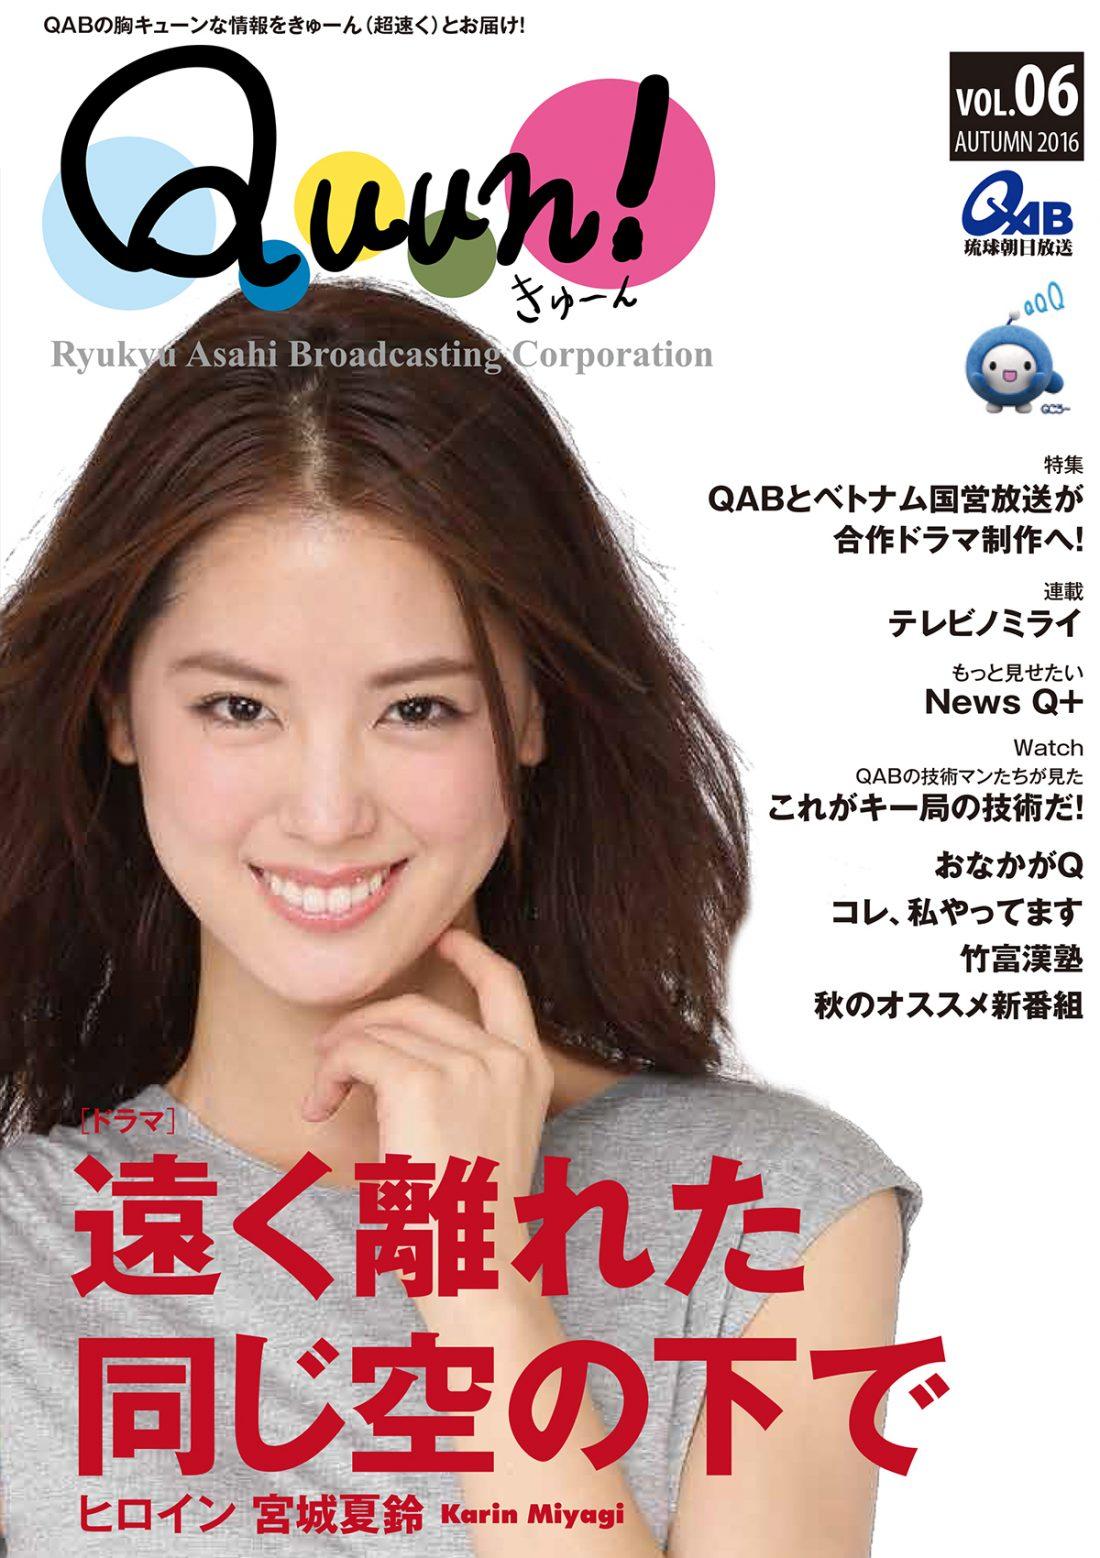 https://www.qab.co.jp/qgoro/wp-content/uploads/quun_0601-1100x1558.jpg